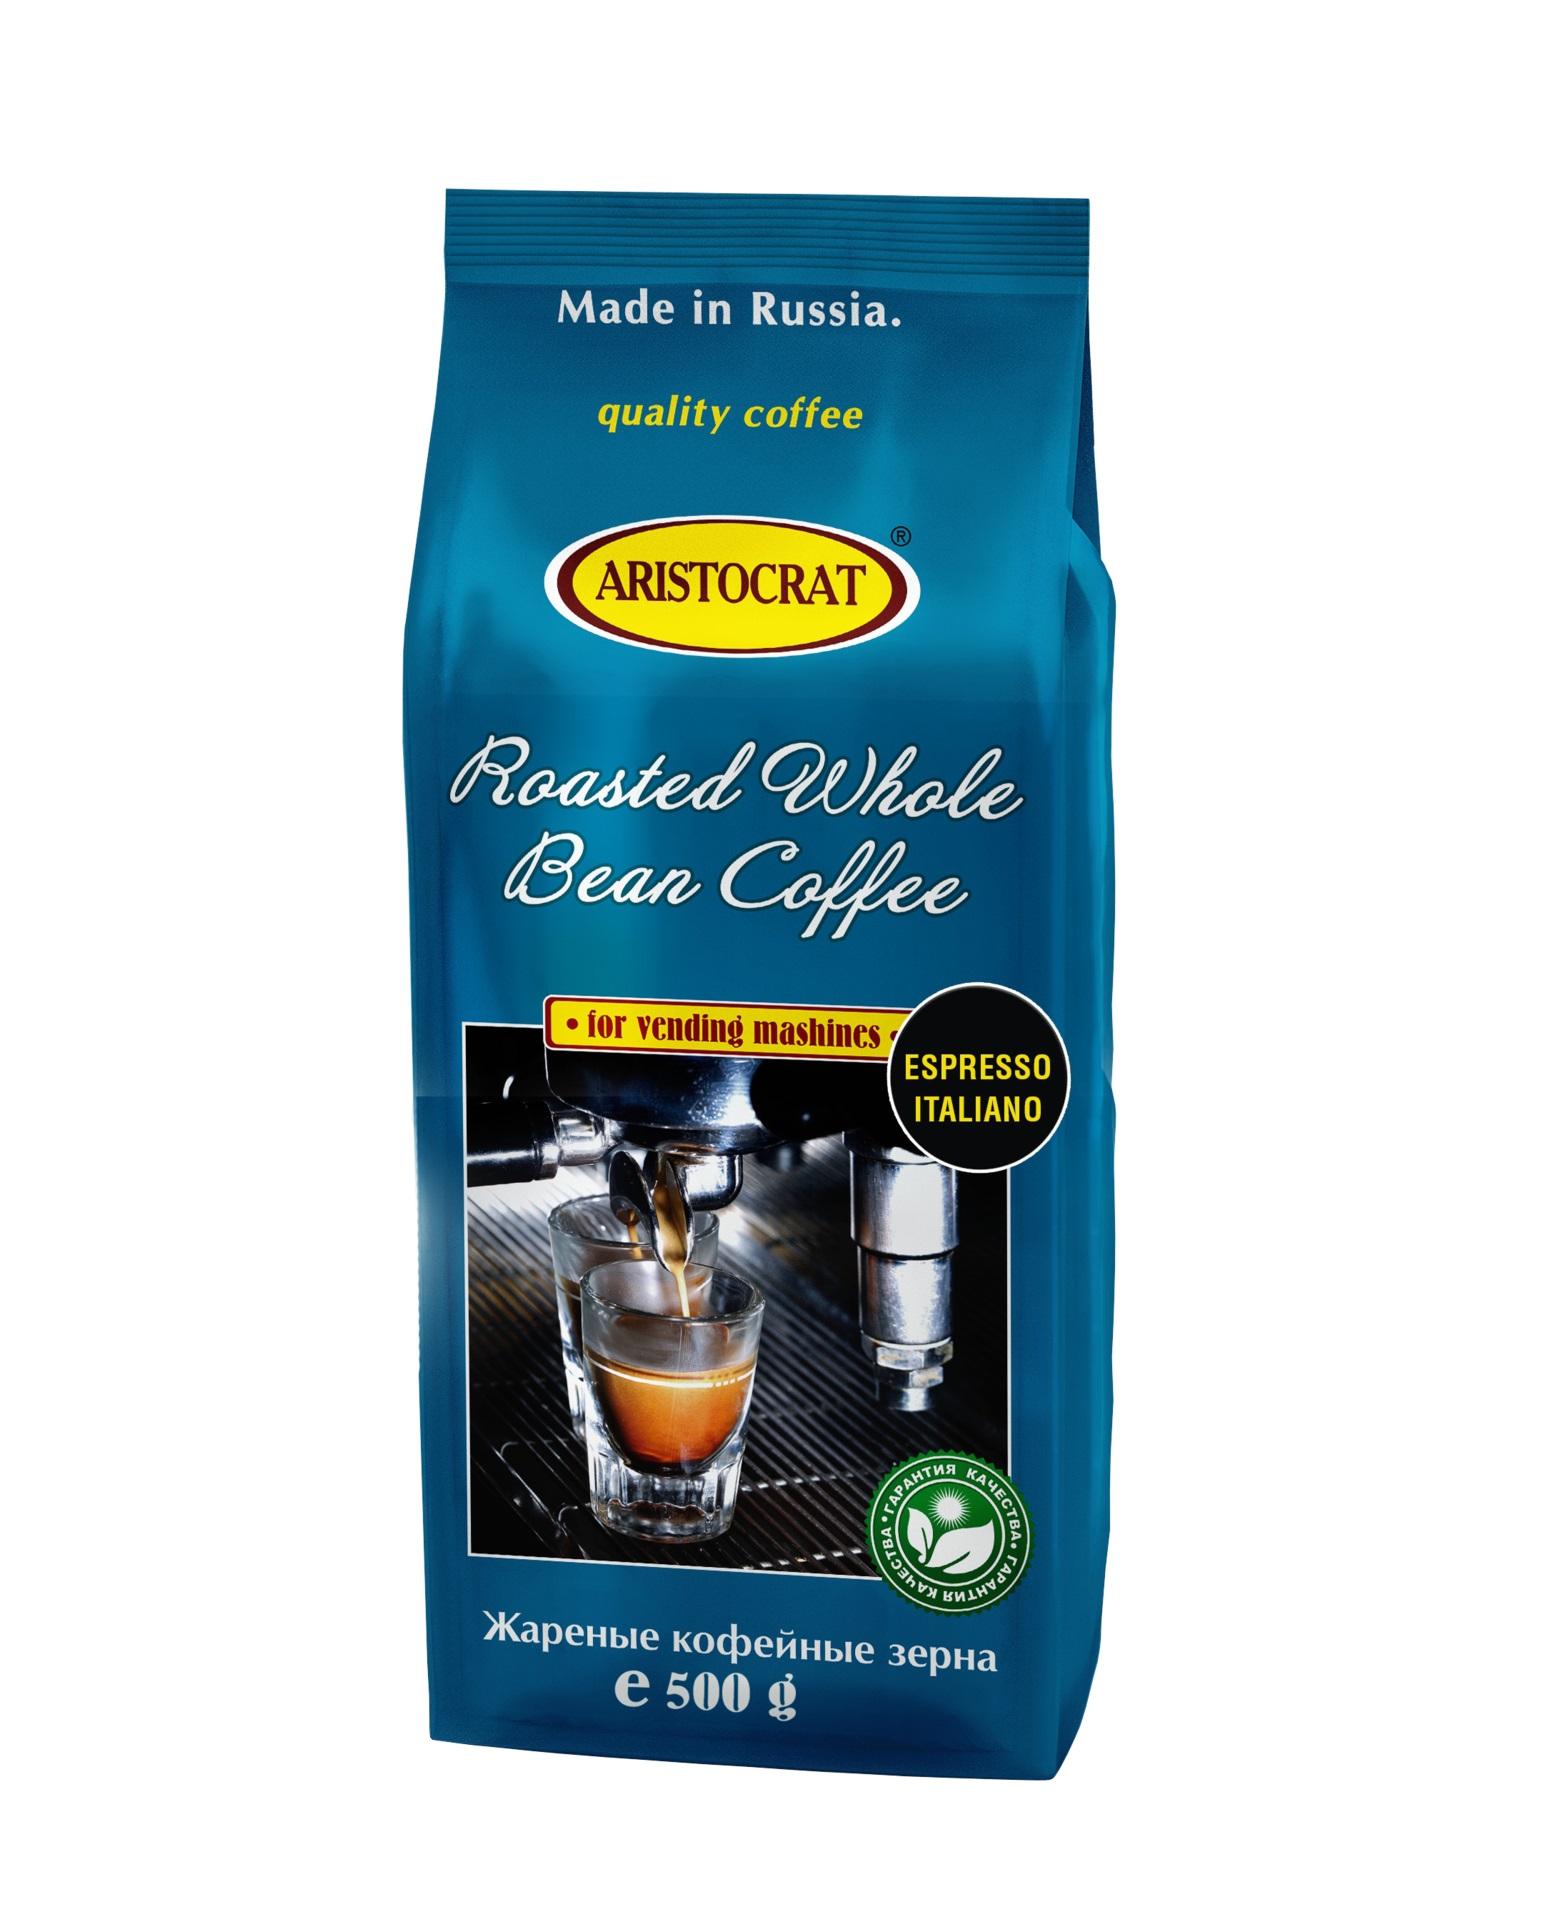 Кофе зерновой ARISTOCRAT Espresso Italiano 0,5 кг.